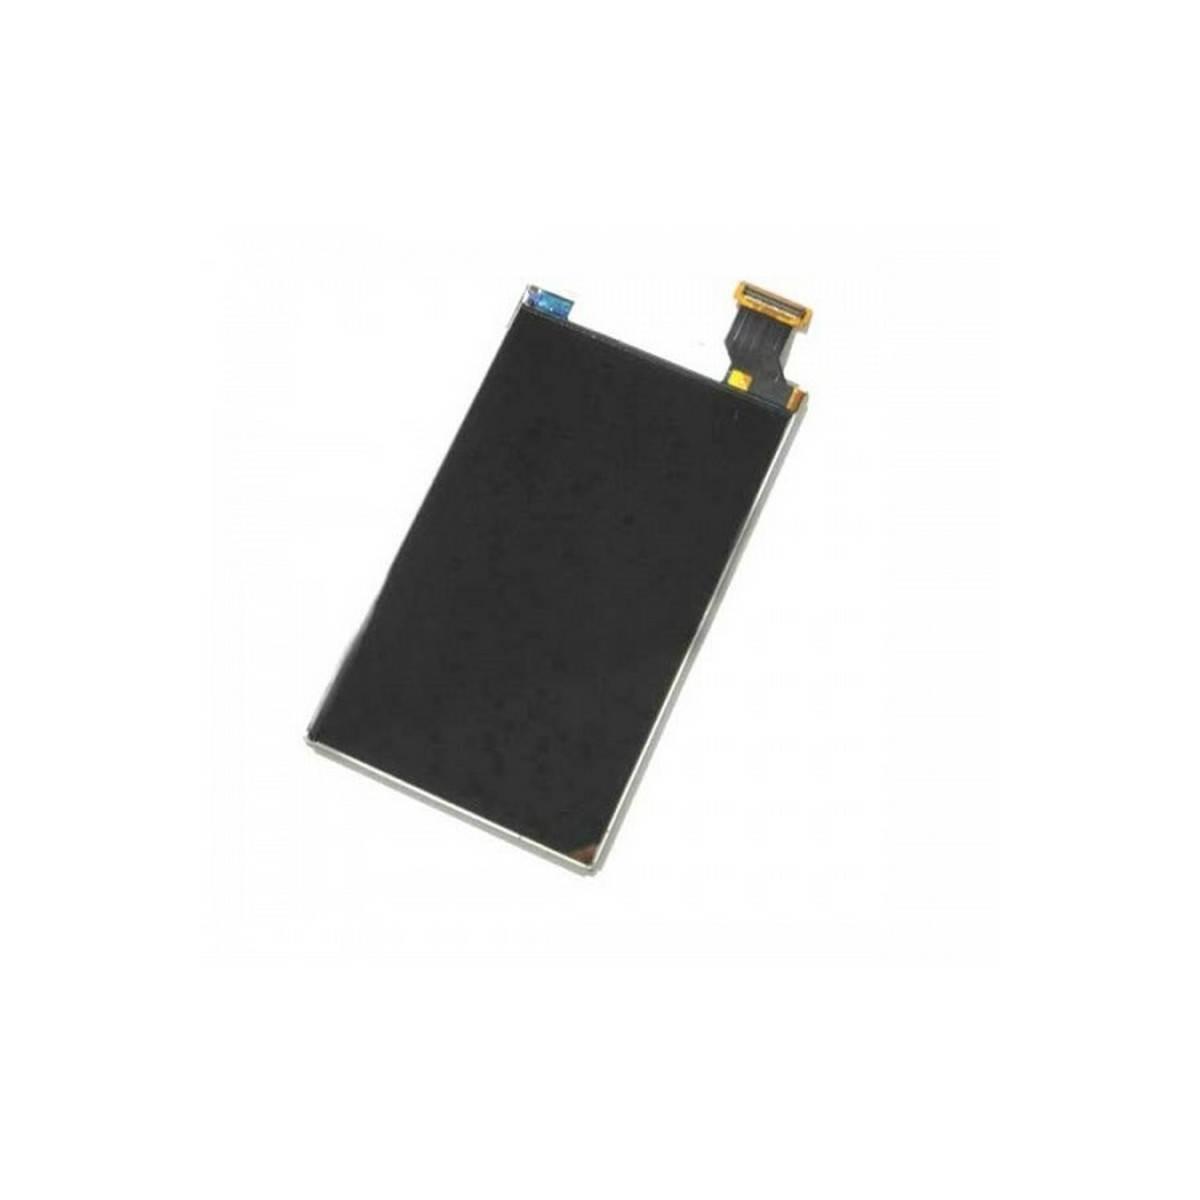 PANTALLA LCD NOKIA LUMIA 710